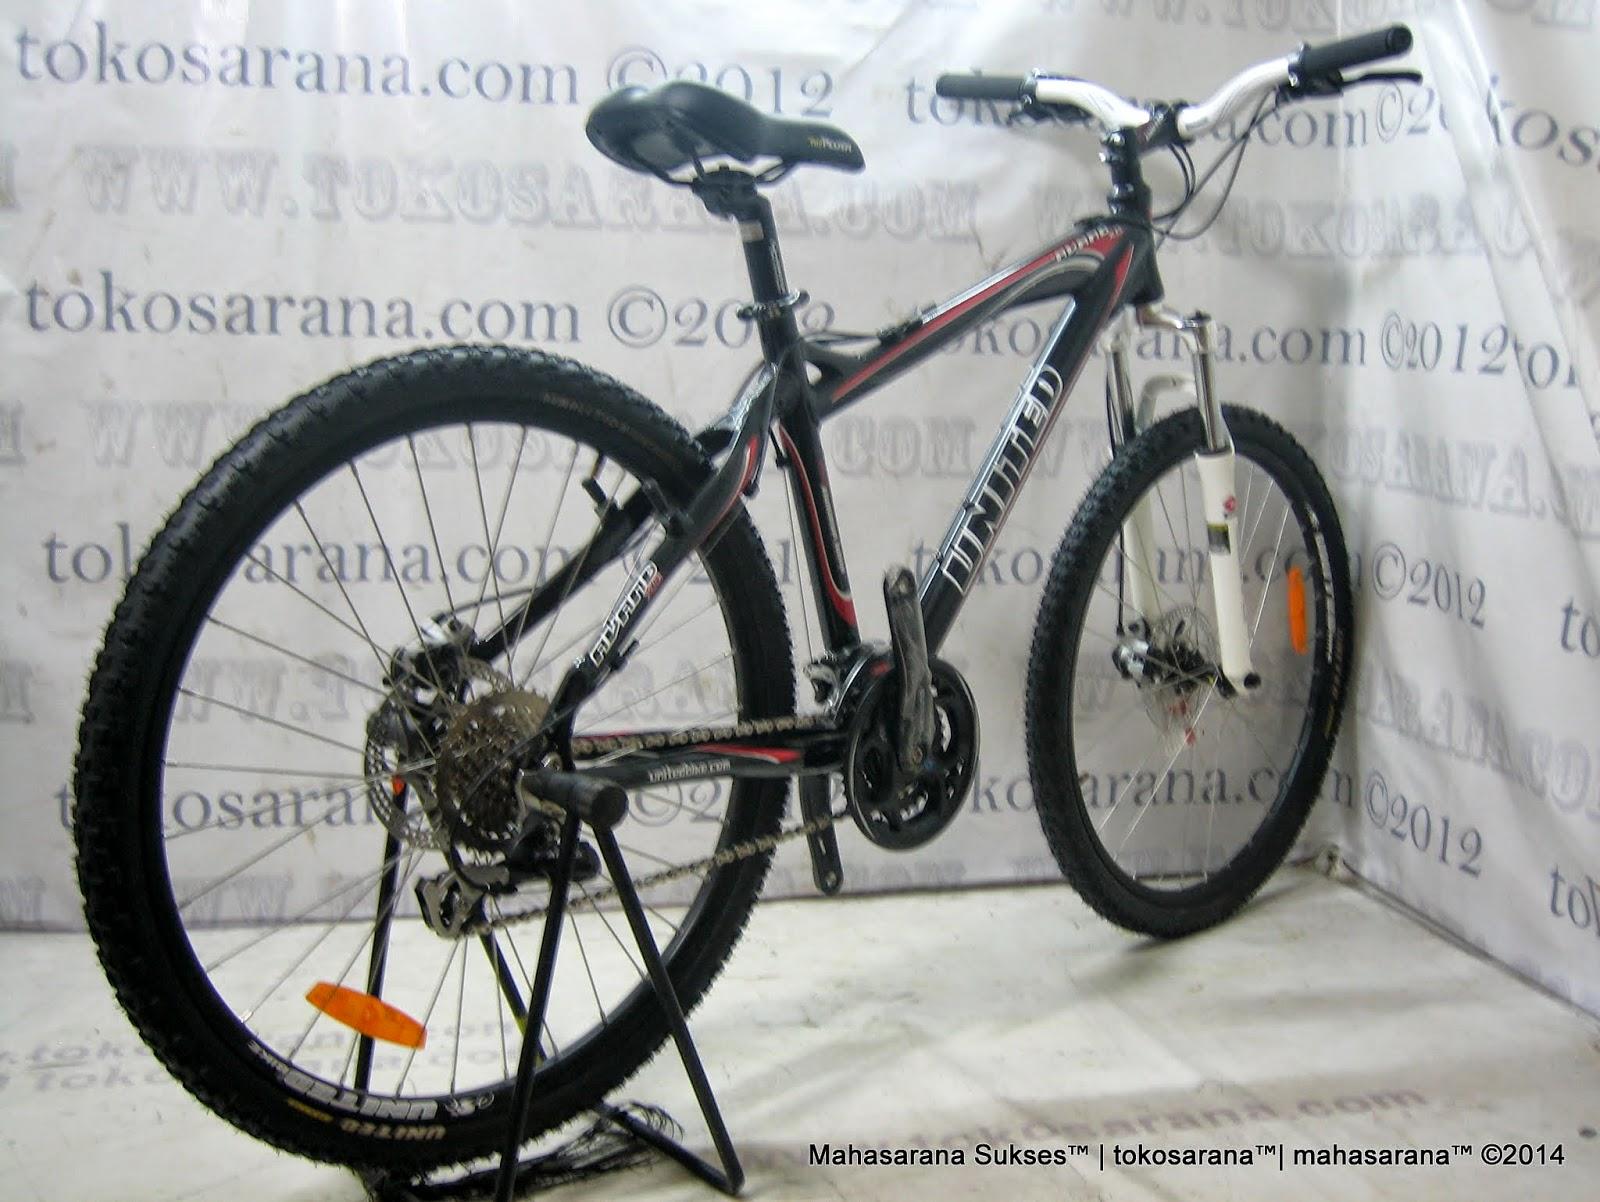 Sepeda Gunung United Avand 24 Speed Shimano Altus/Alivio 26 Inci